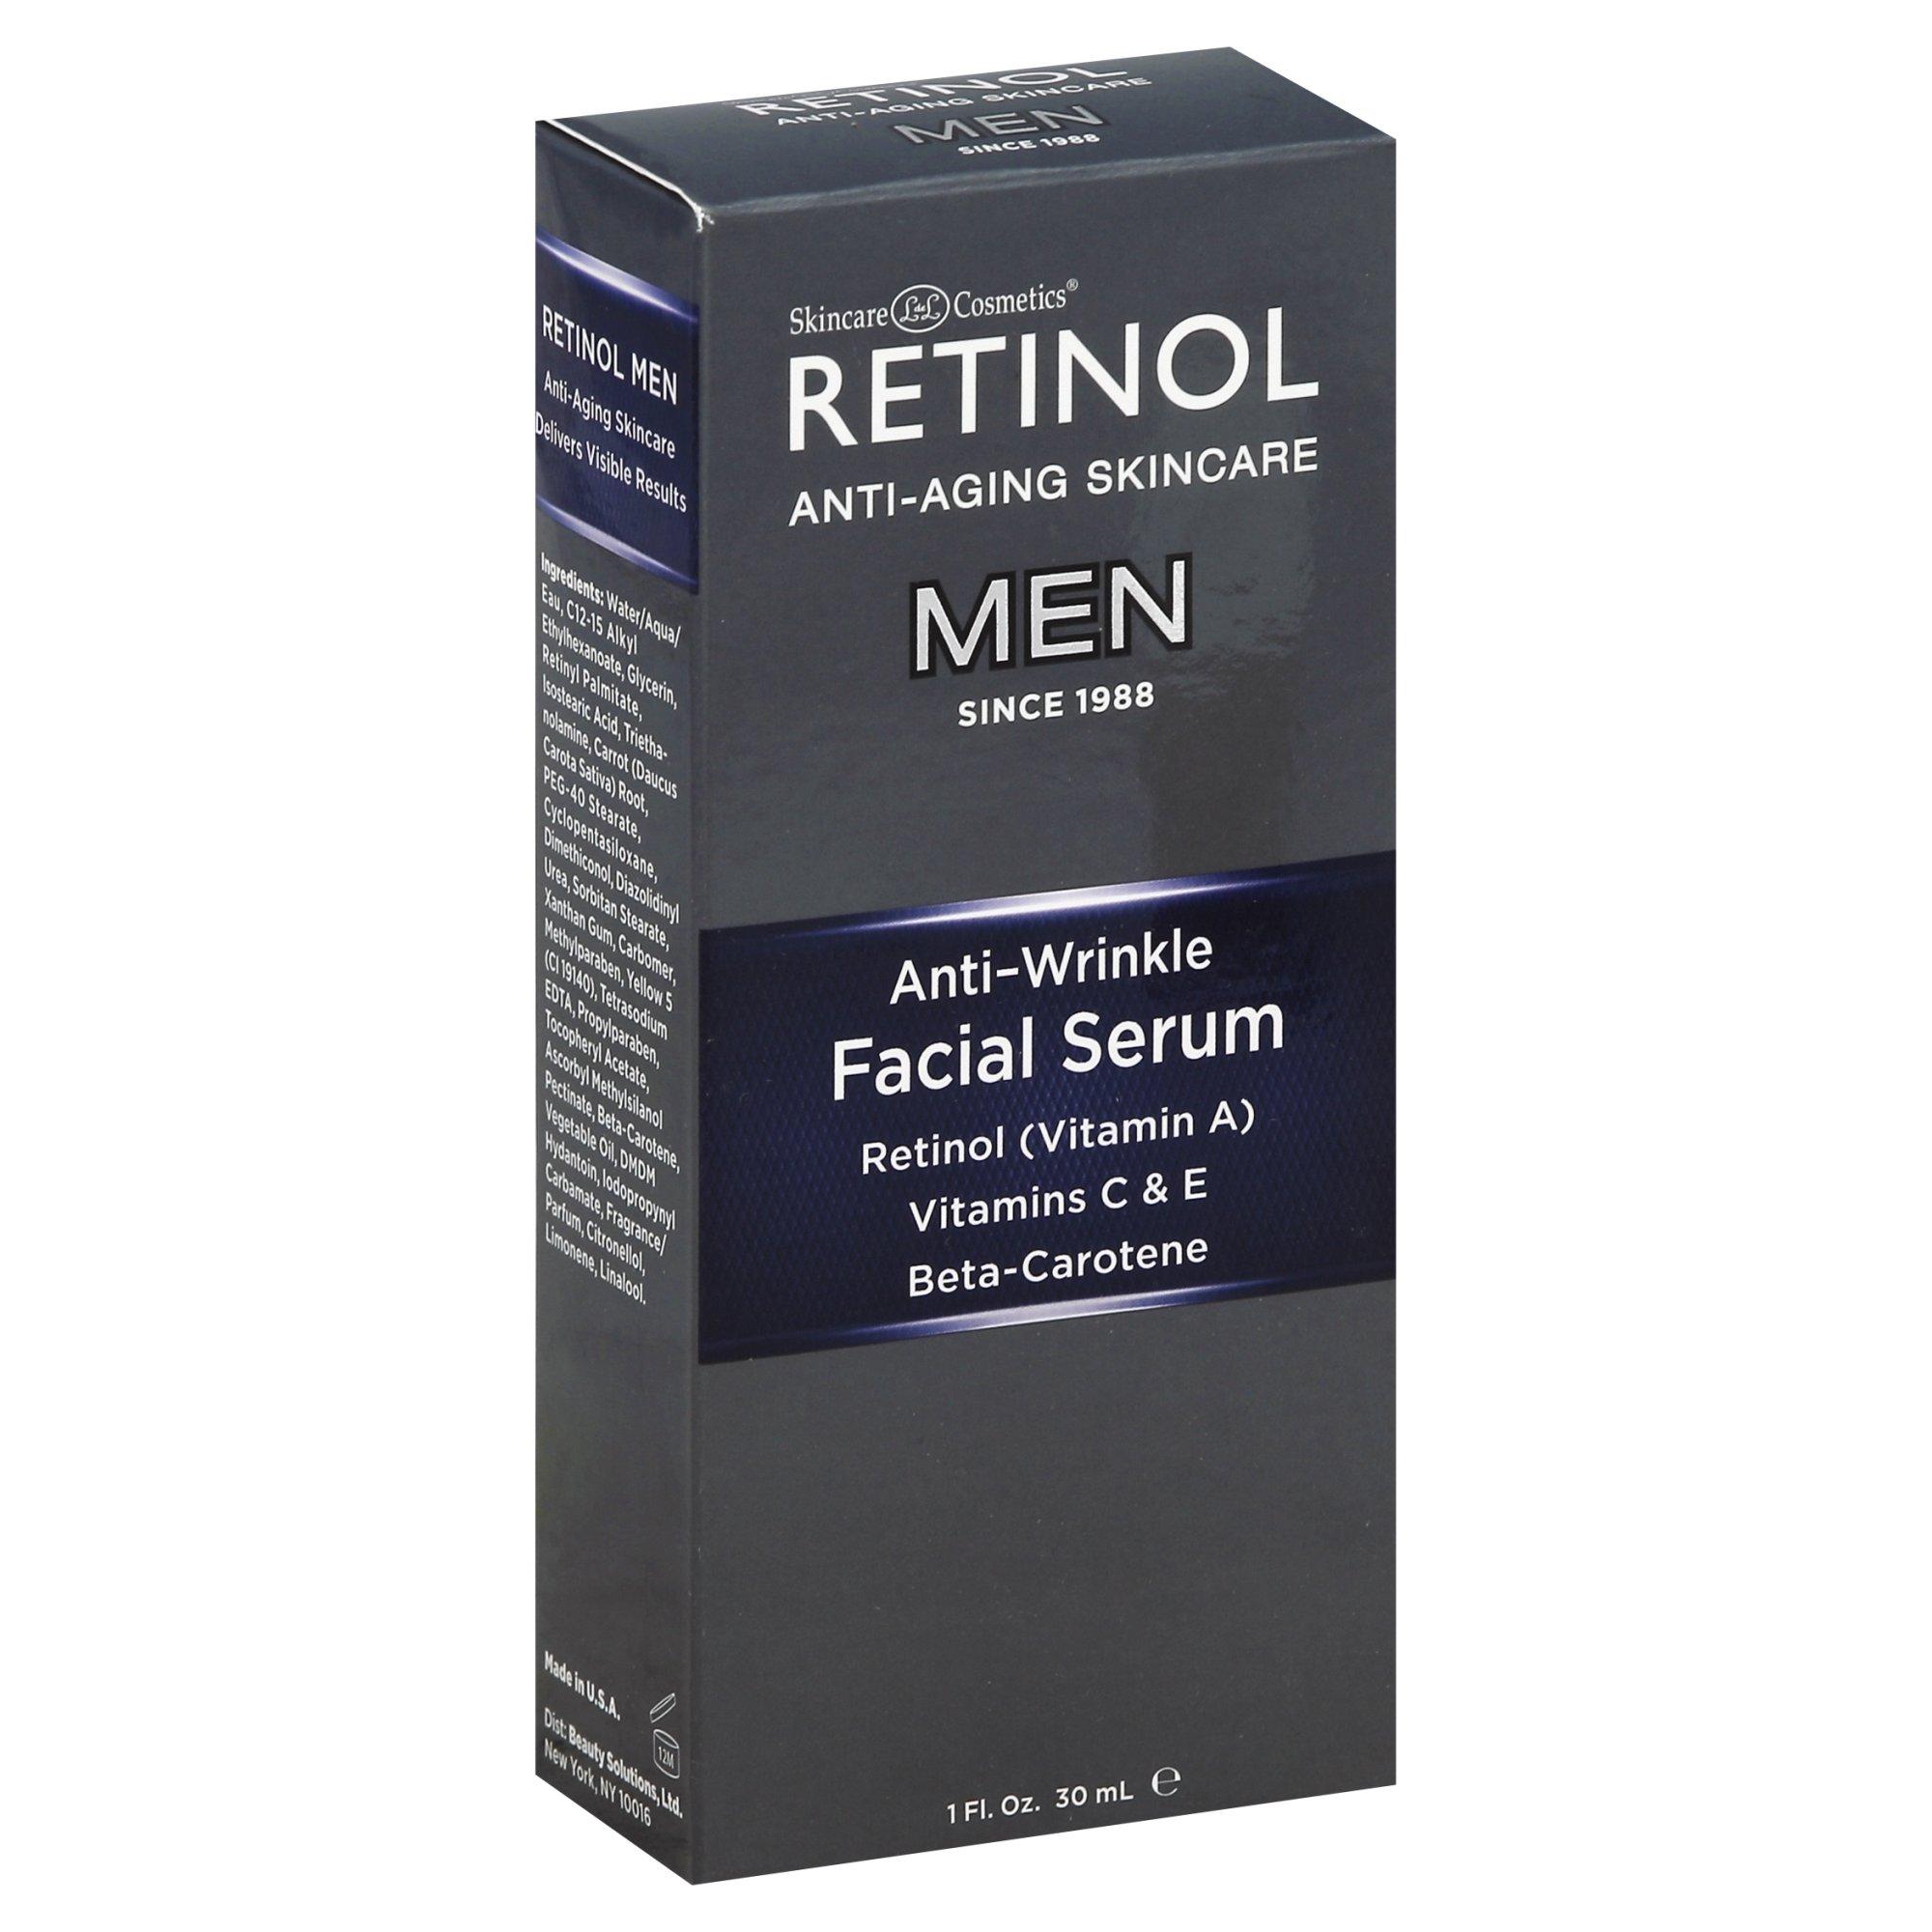 Revolution Skincare Fine Line Correcting Serum – 0.2% Retinol